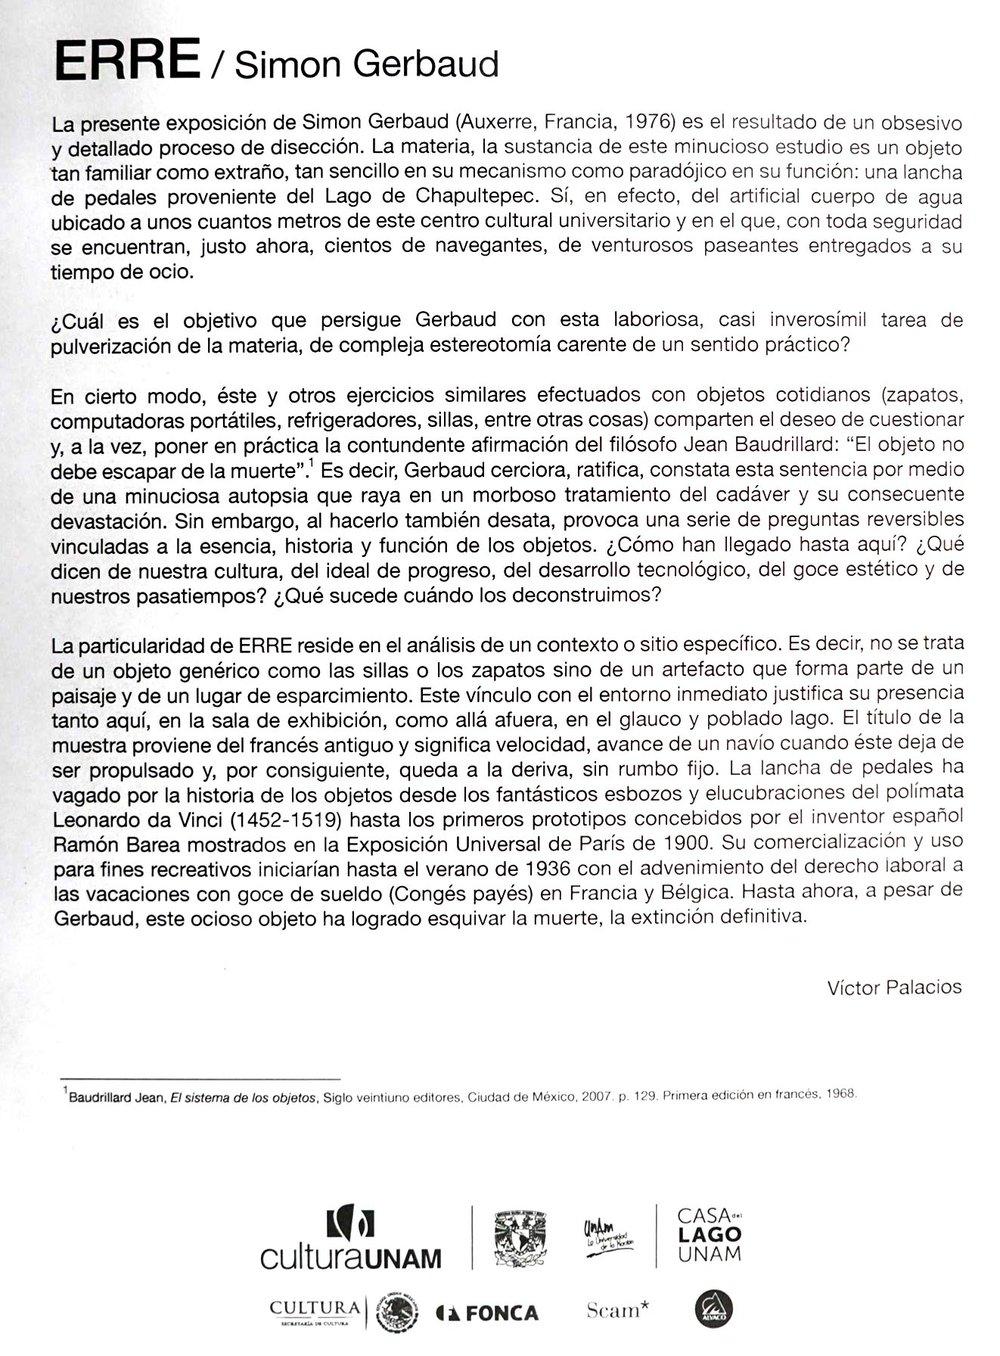 ERRE-TEXTO-CURADOR-CASA_DEL_LAGO.jpg